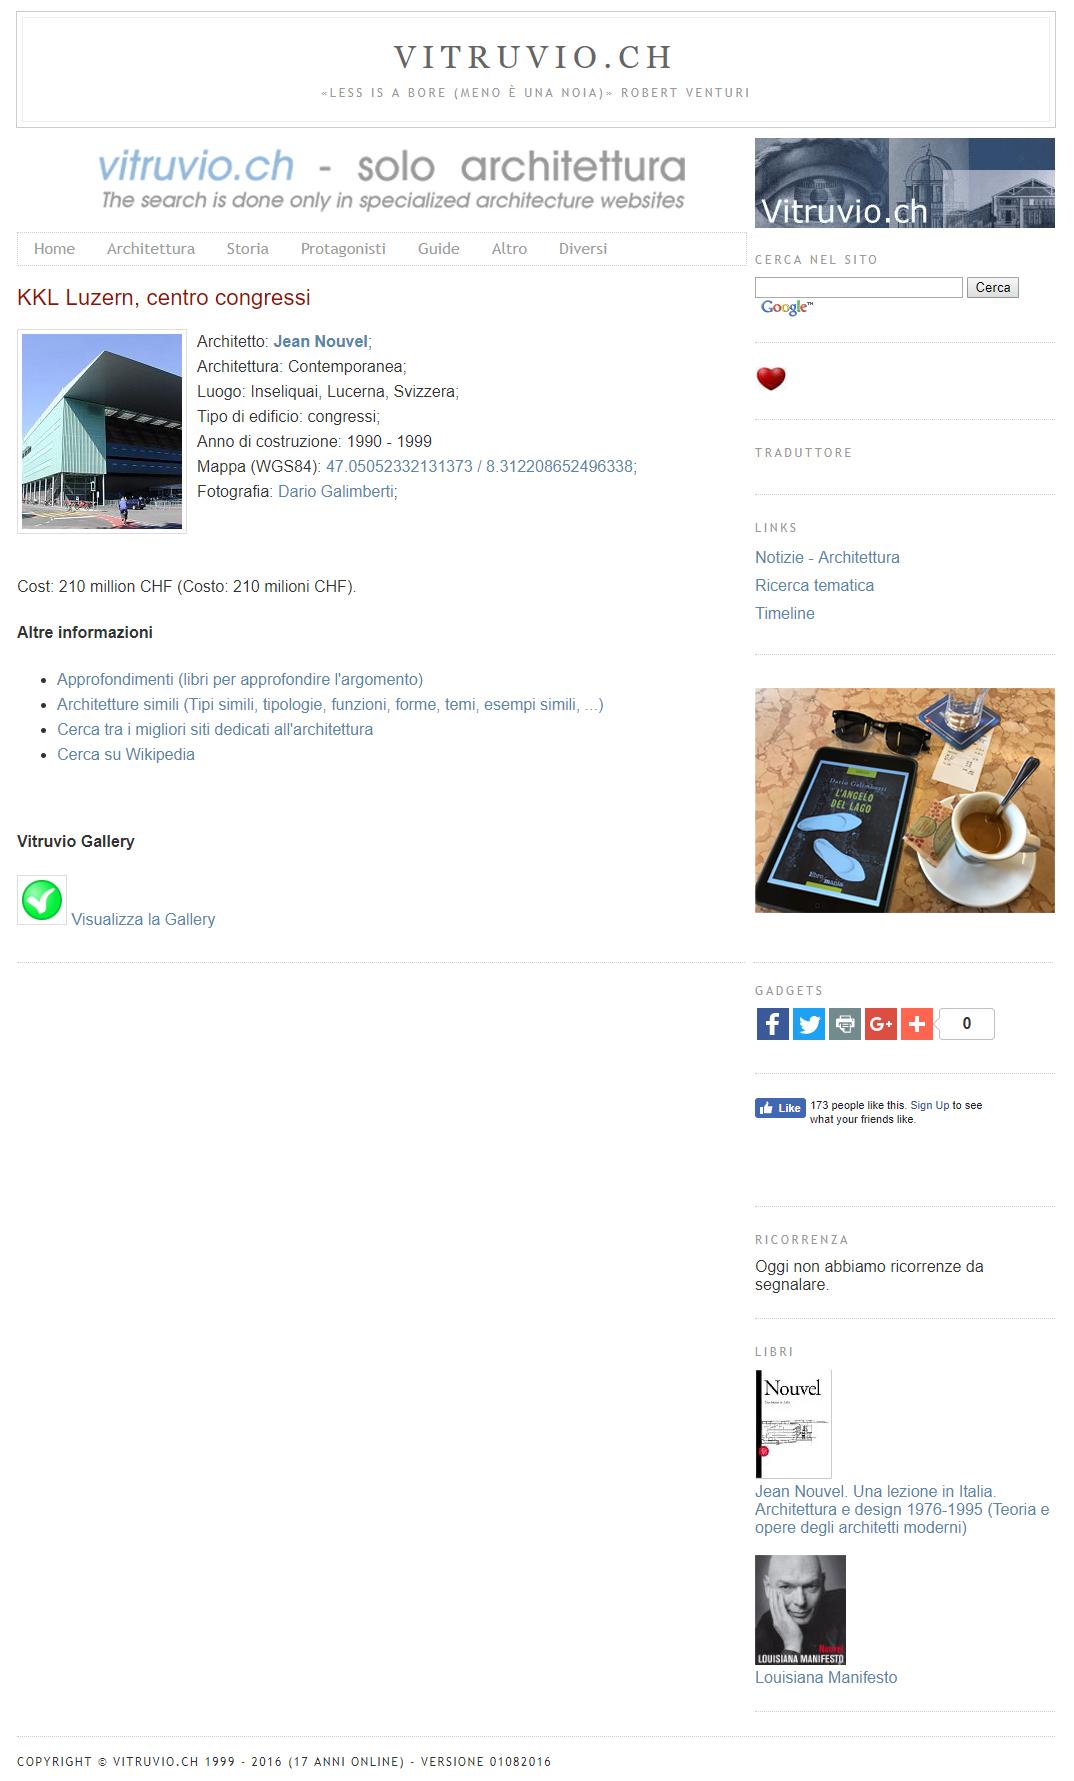 Vitruvio.ch - Versione 2016